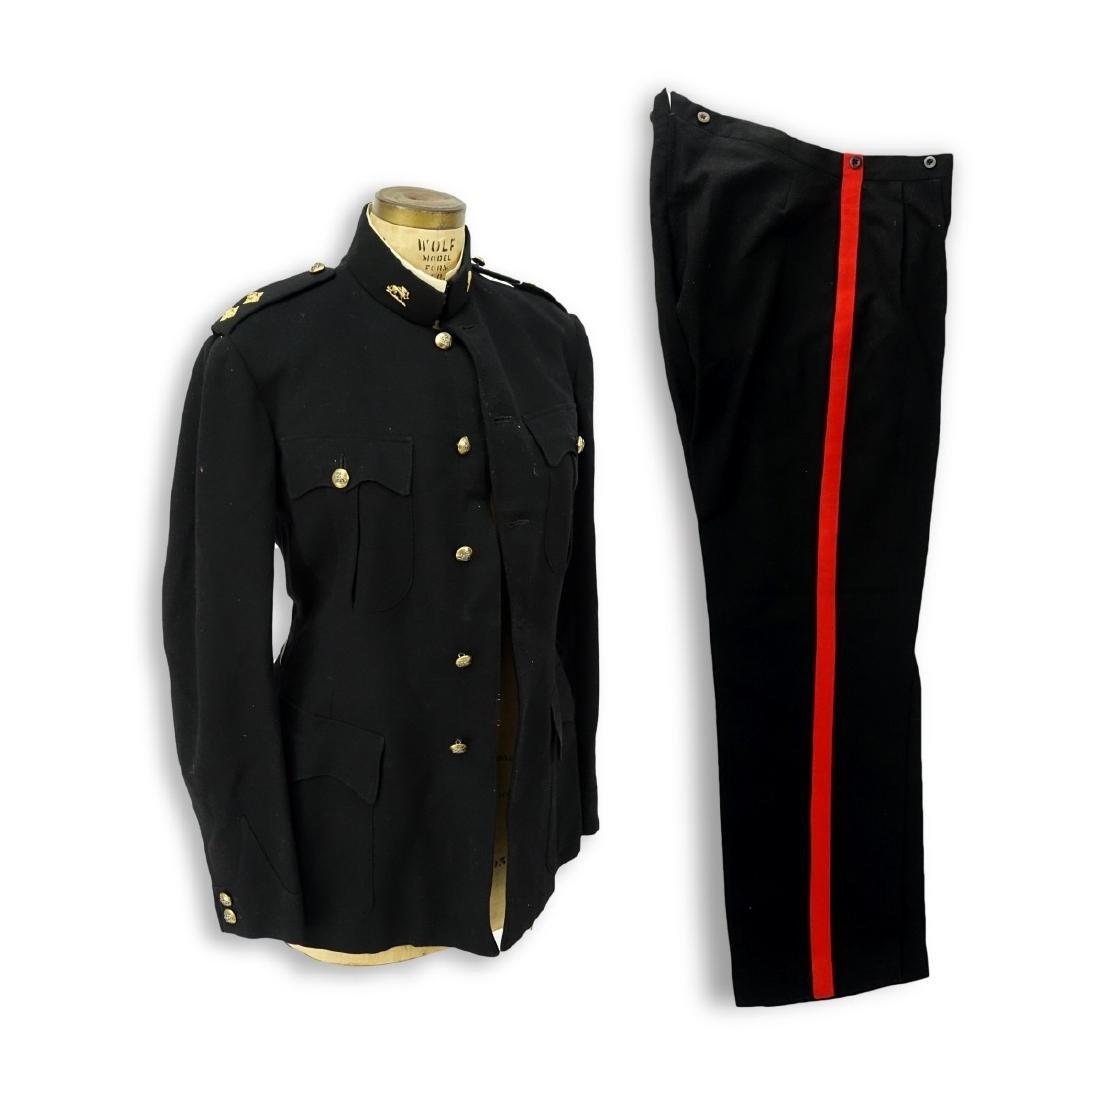 Vintage 2 Piece Military Patrol Uniform